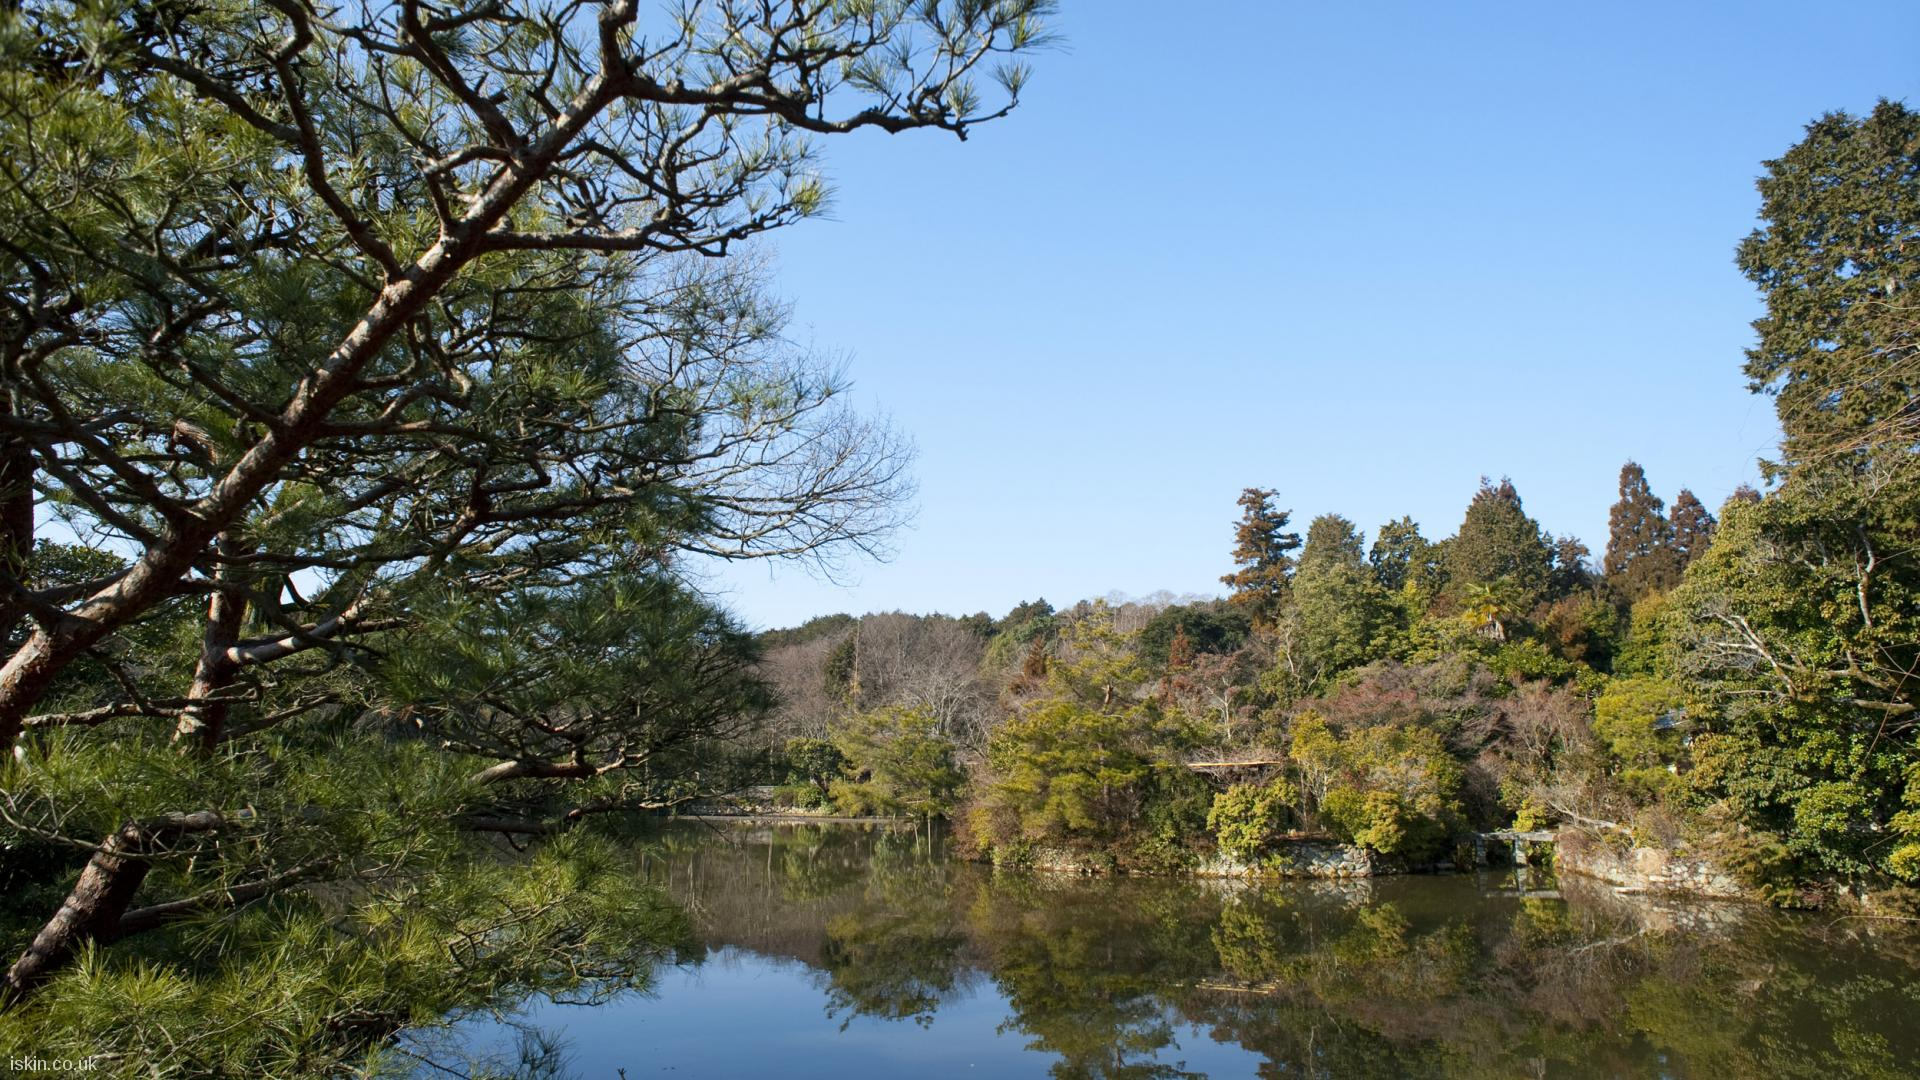 Image Gallery Of Japanese Garden Wallpaper